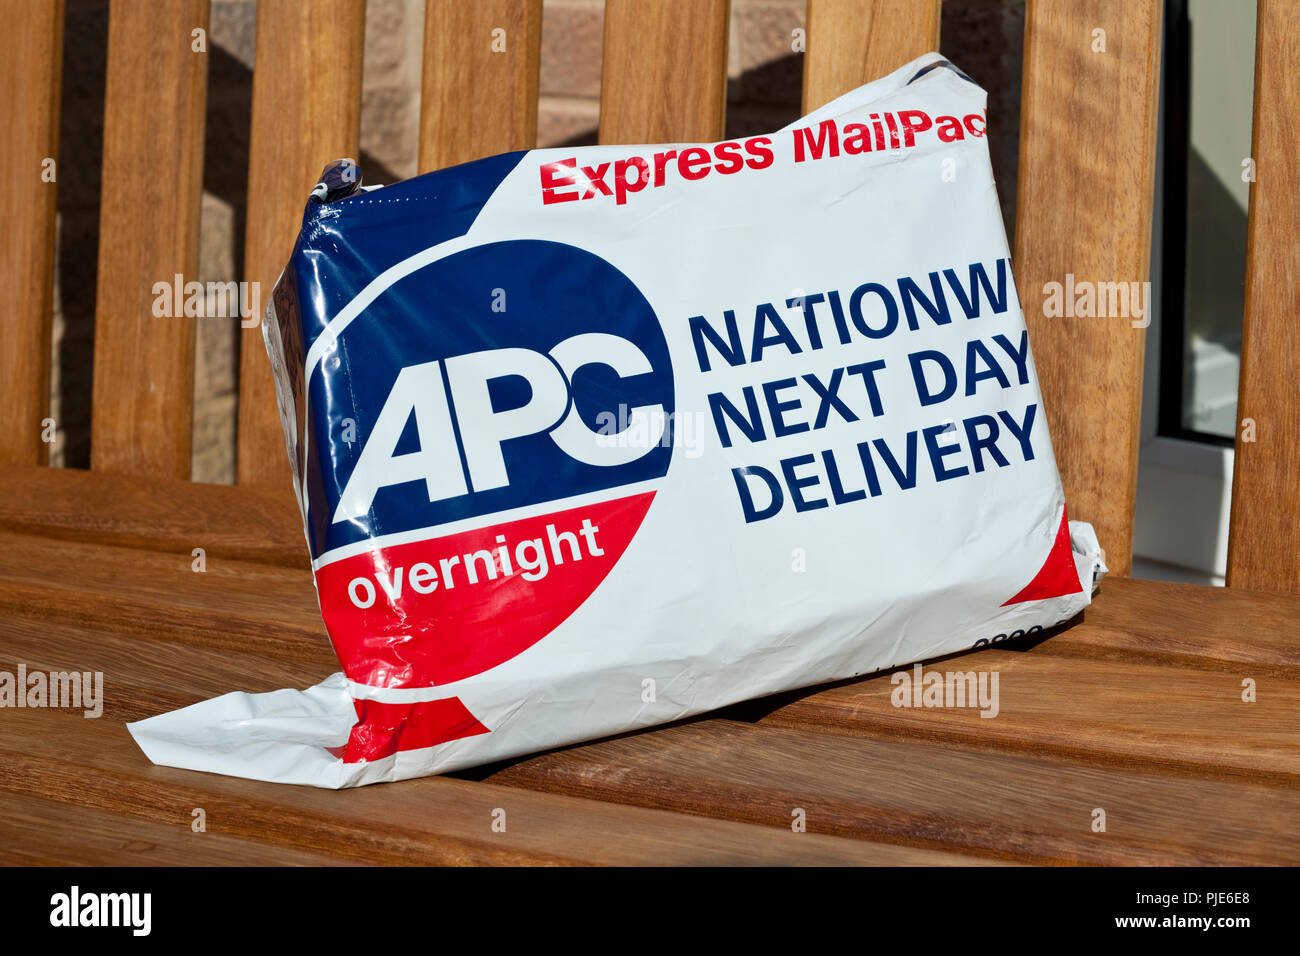 APC overnight express mail parcel England UK United Kingdom GB Great Britain - Stock Image